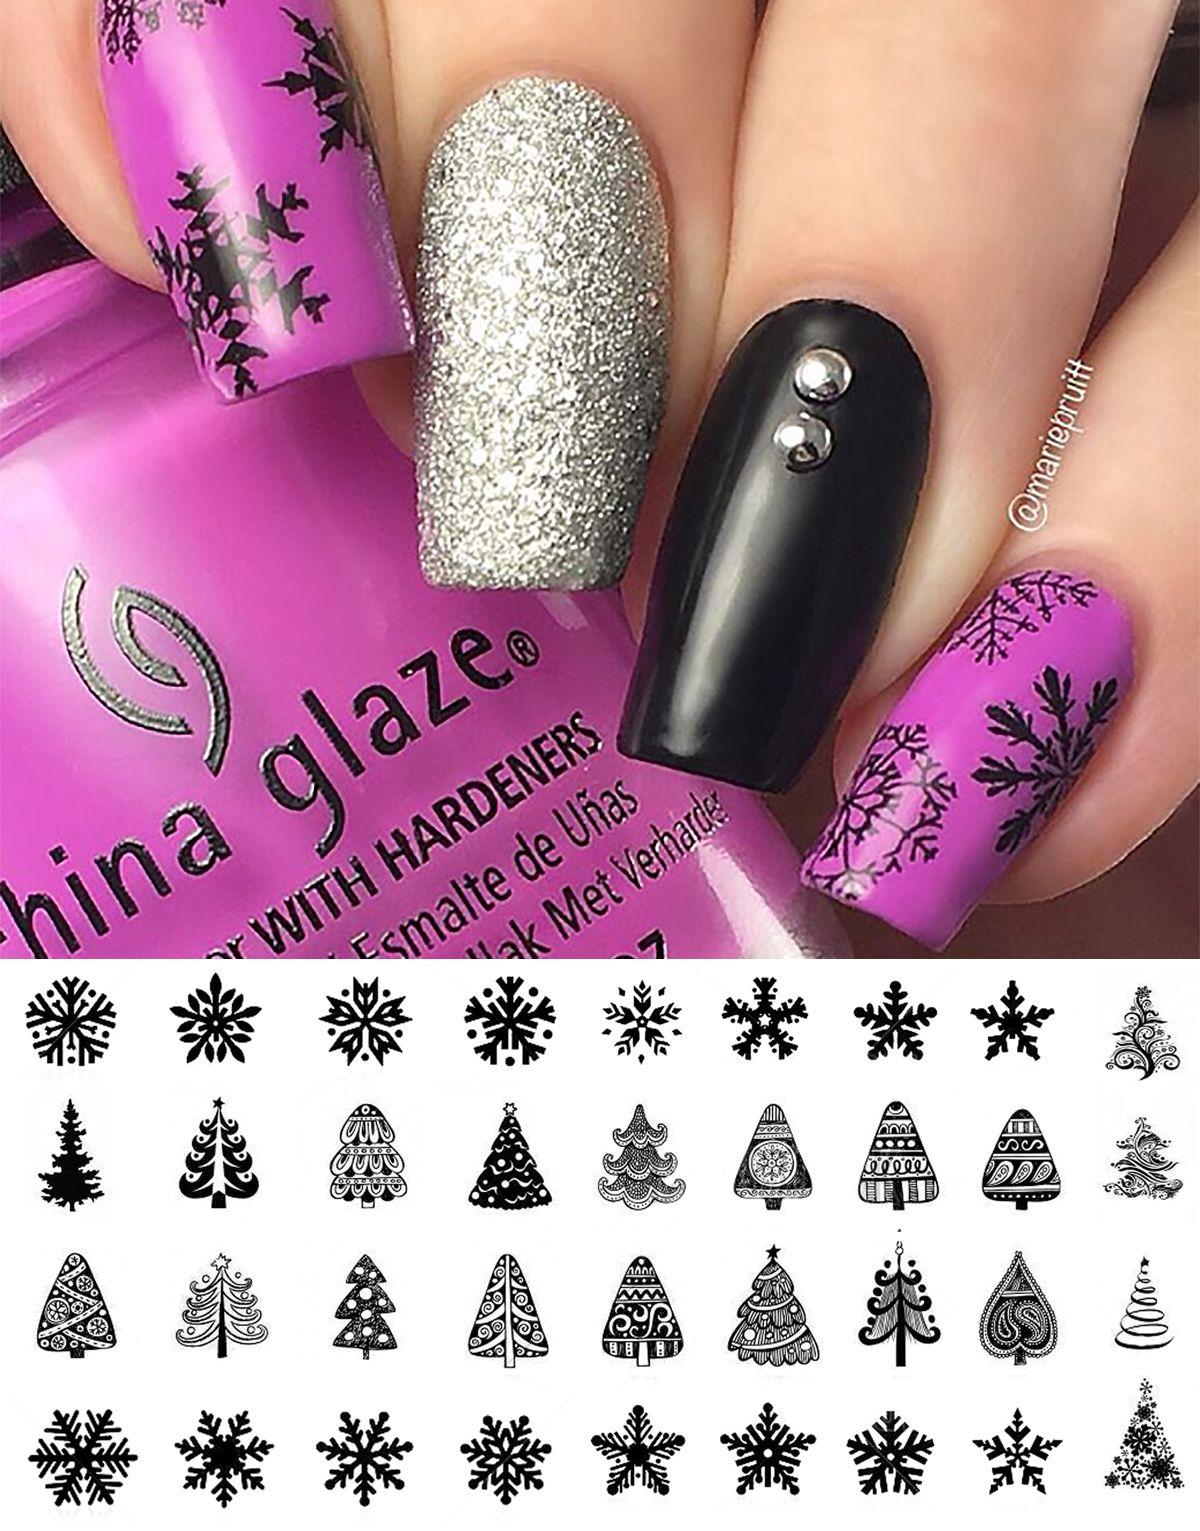 Pin By Moon Sugar Decals On Christmas Nail Art Decals Nail Art Nails Christmas Nails